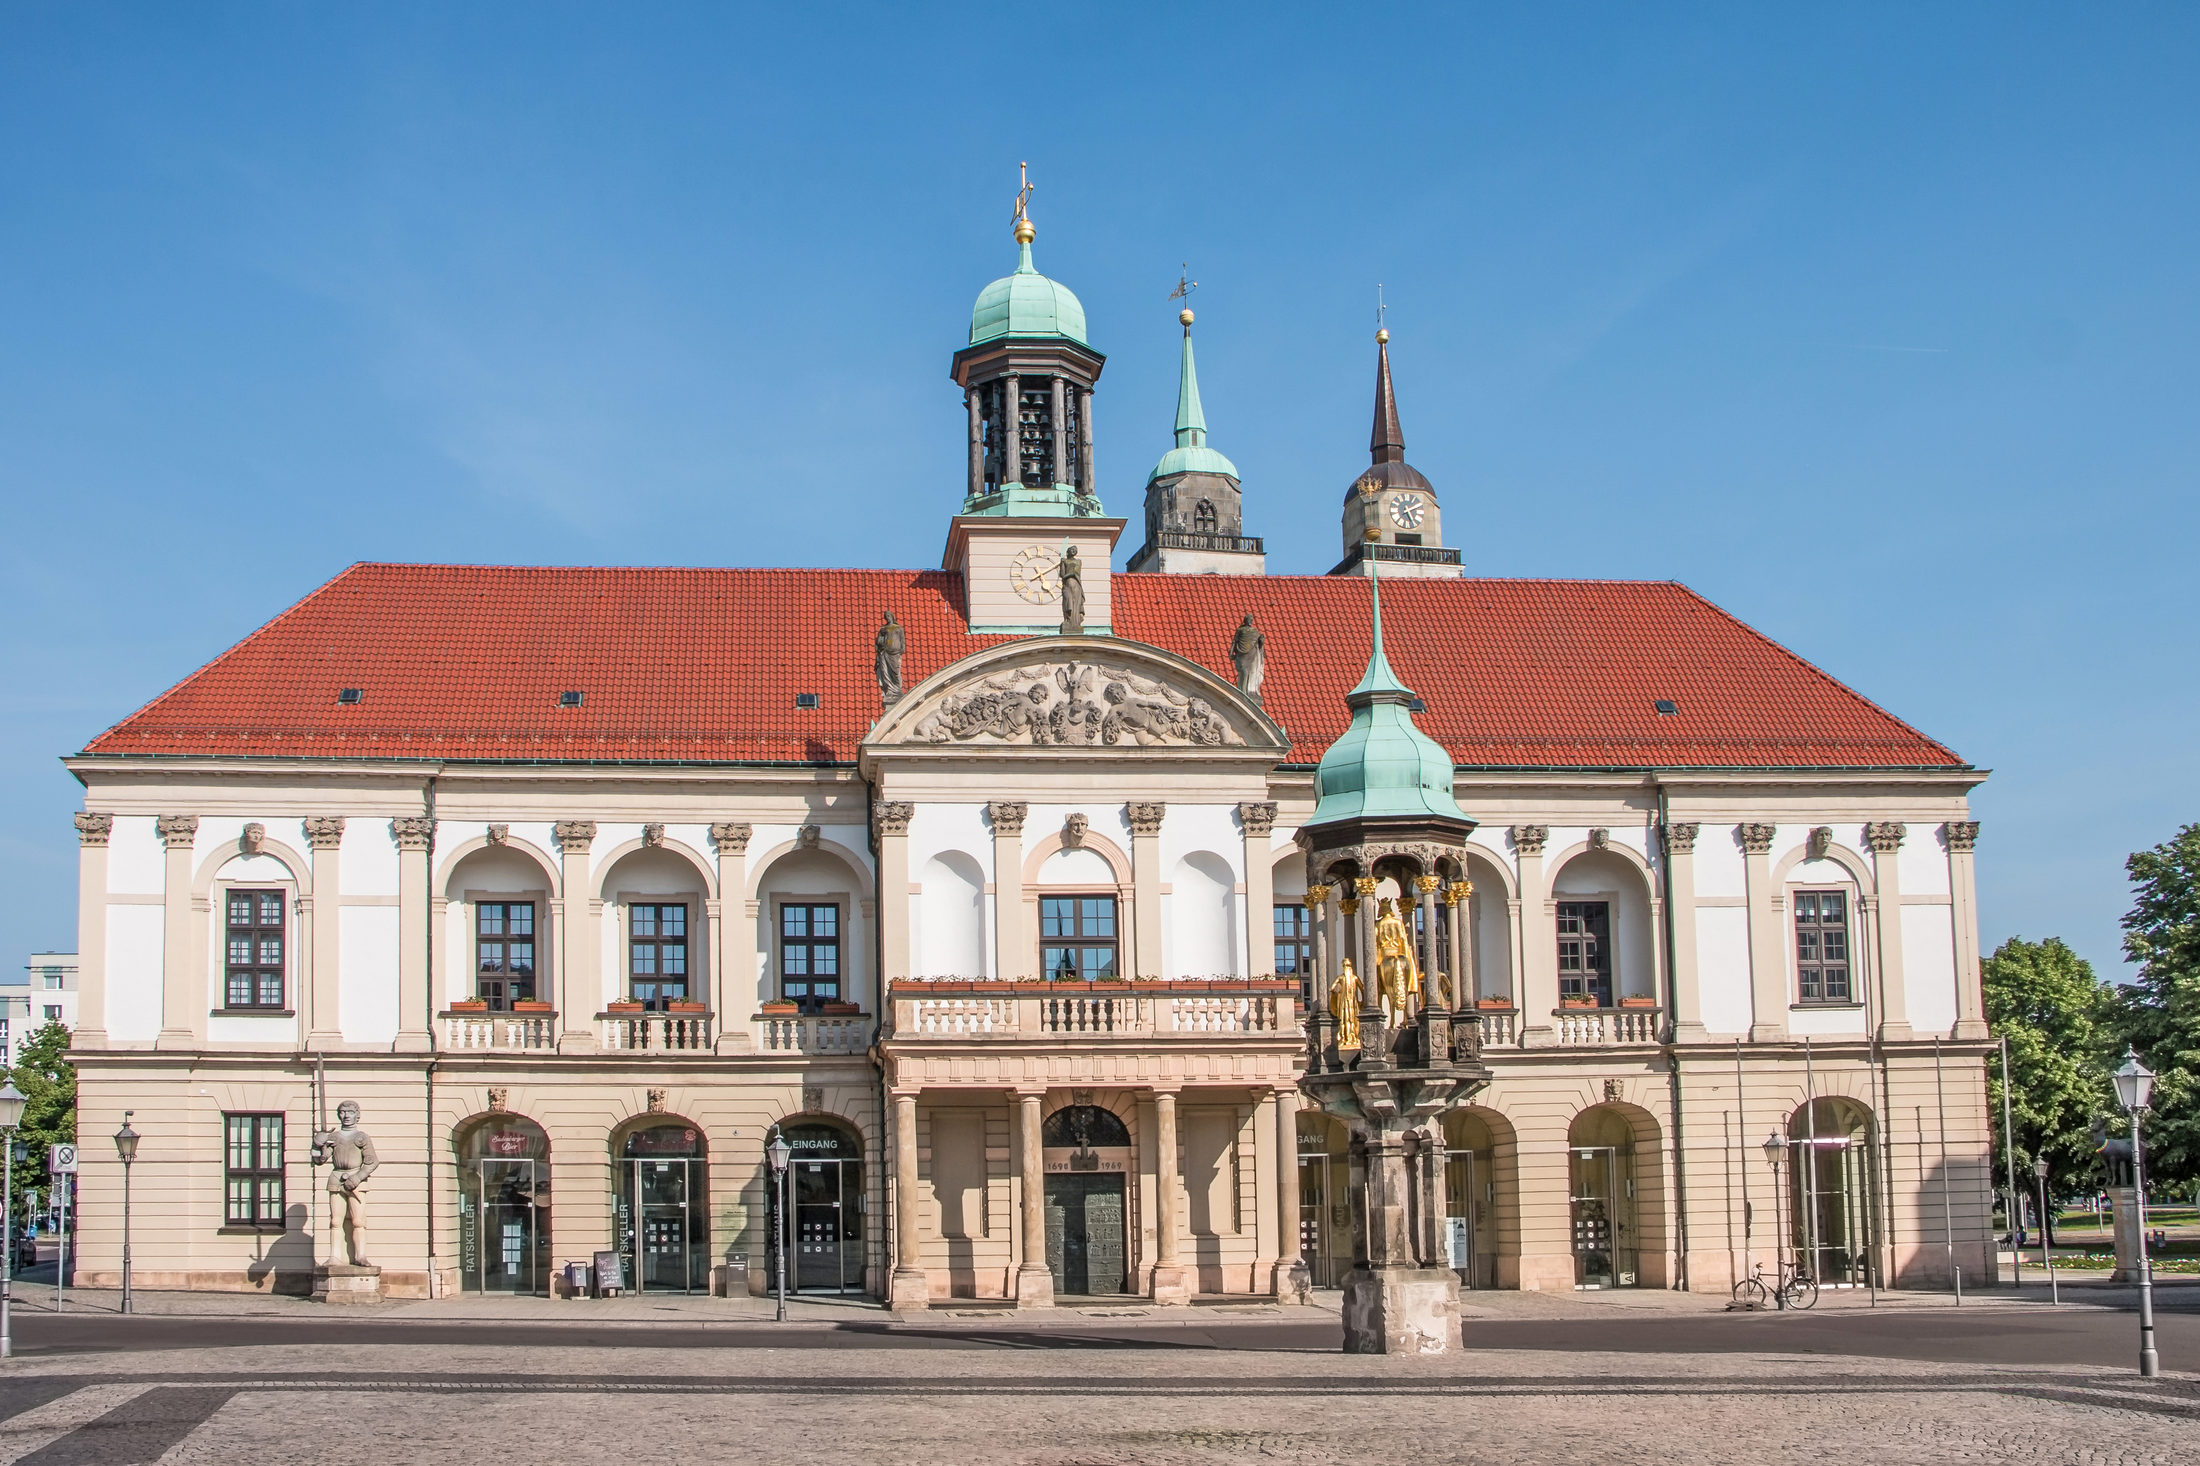 Braunschweig Magdeburg